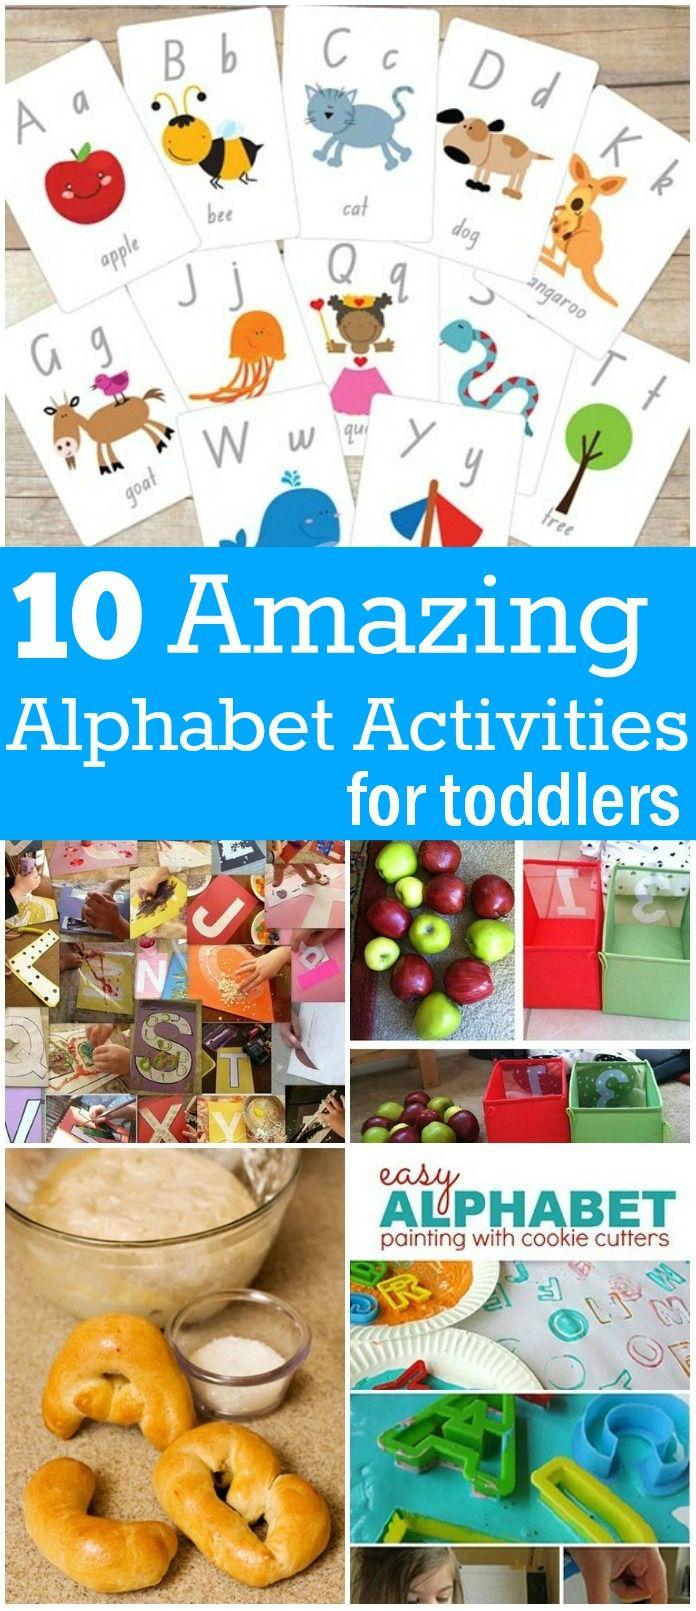 5 Ways to Teach the Alphabet - Teaching Mama